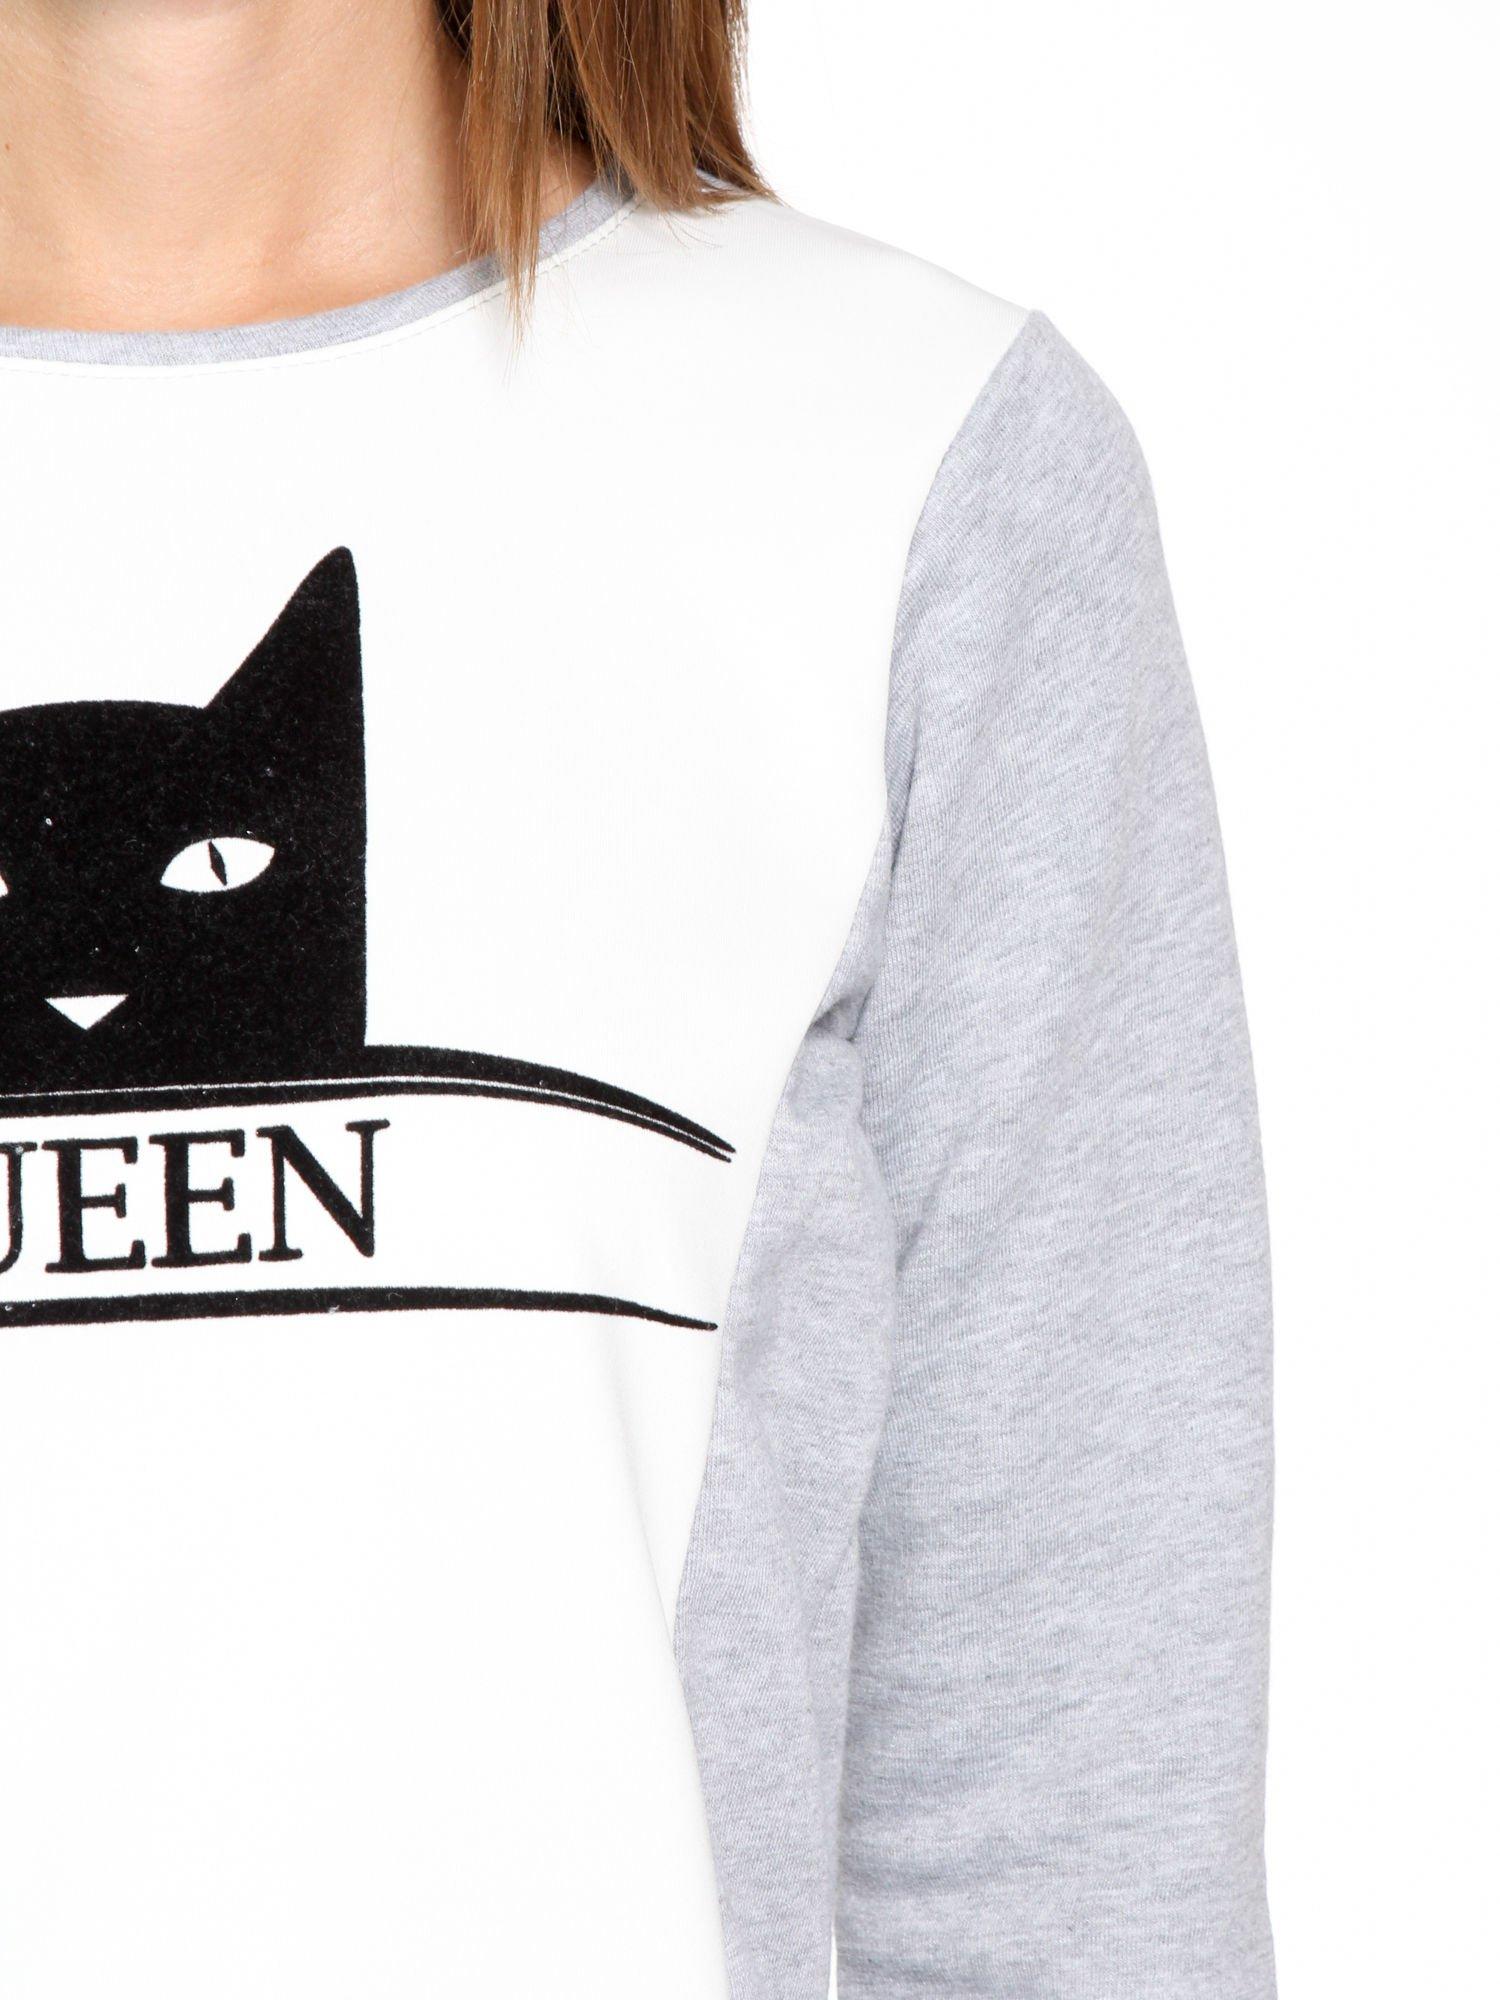 Szara dresowa bluza z nadrukiem kota i napisem QUEEN                                  zdj.                                  6